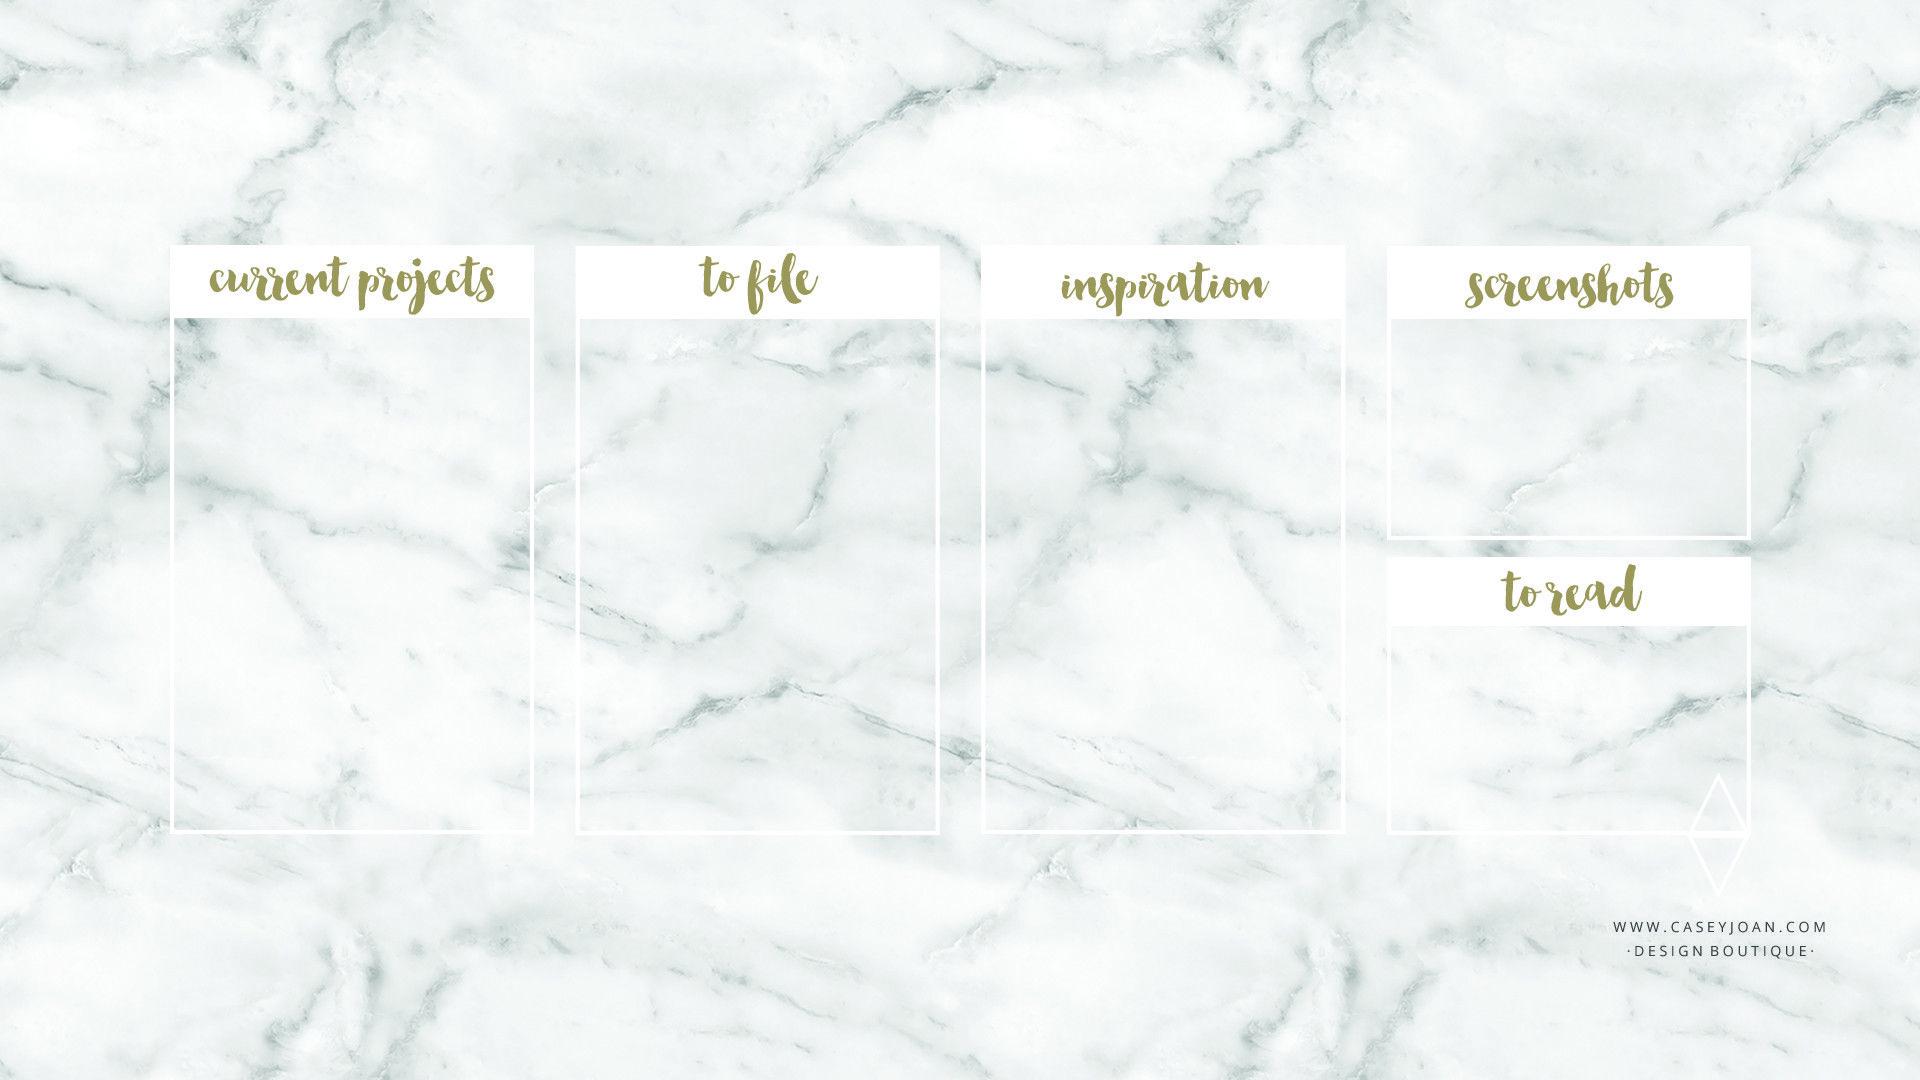 1920x1080 Marble Desktop Wallpaper Laptop Wallpaper Desktop Wallpaper Organizer Find the best hd cute wallpapers for your desktop, windows screensavers, mac, iphone smartphones or android device. 1920x1080 marble desktop wallpaper